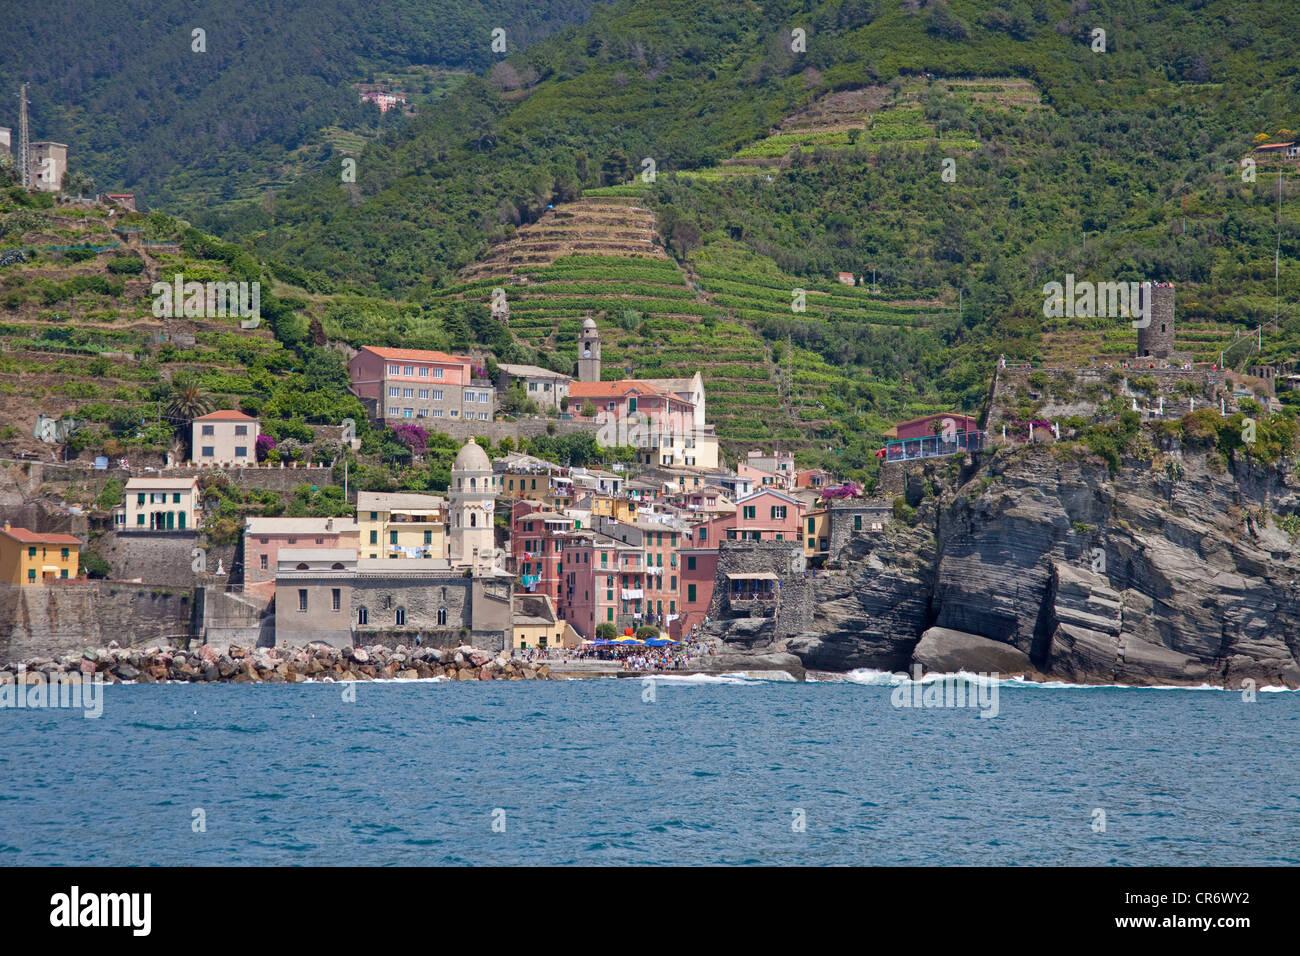 Fischerdorf, Cinque Terre, Provinz La Spezia, Parco Nazionale Delle Cinque Terre Nationalpark, UNESCO-Weltkulturerbe Stockbild